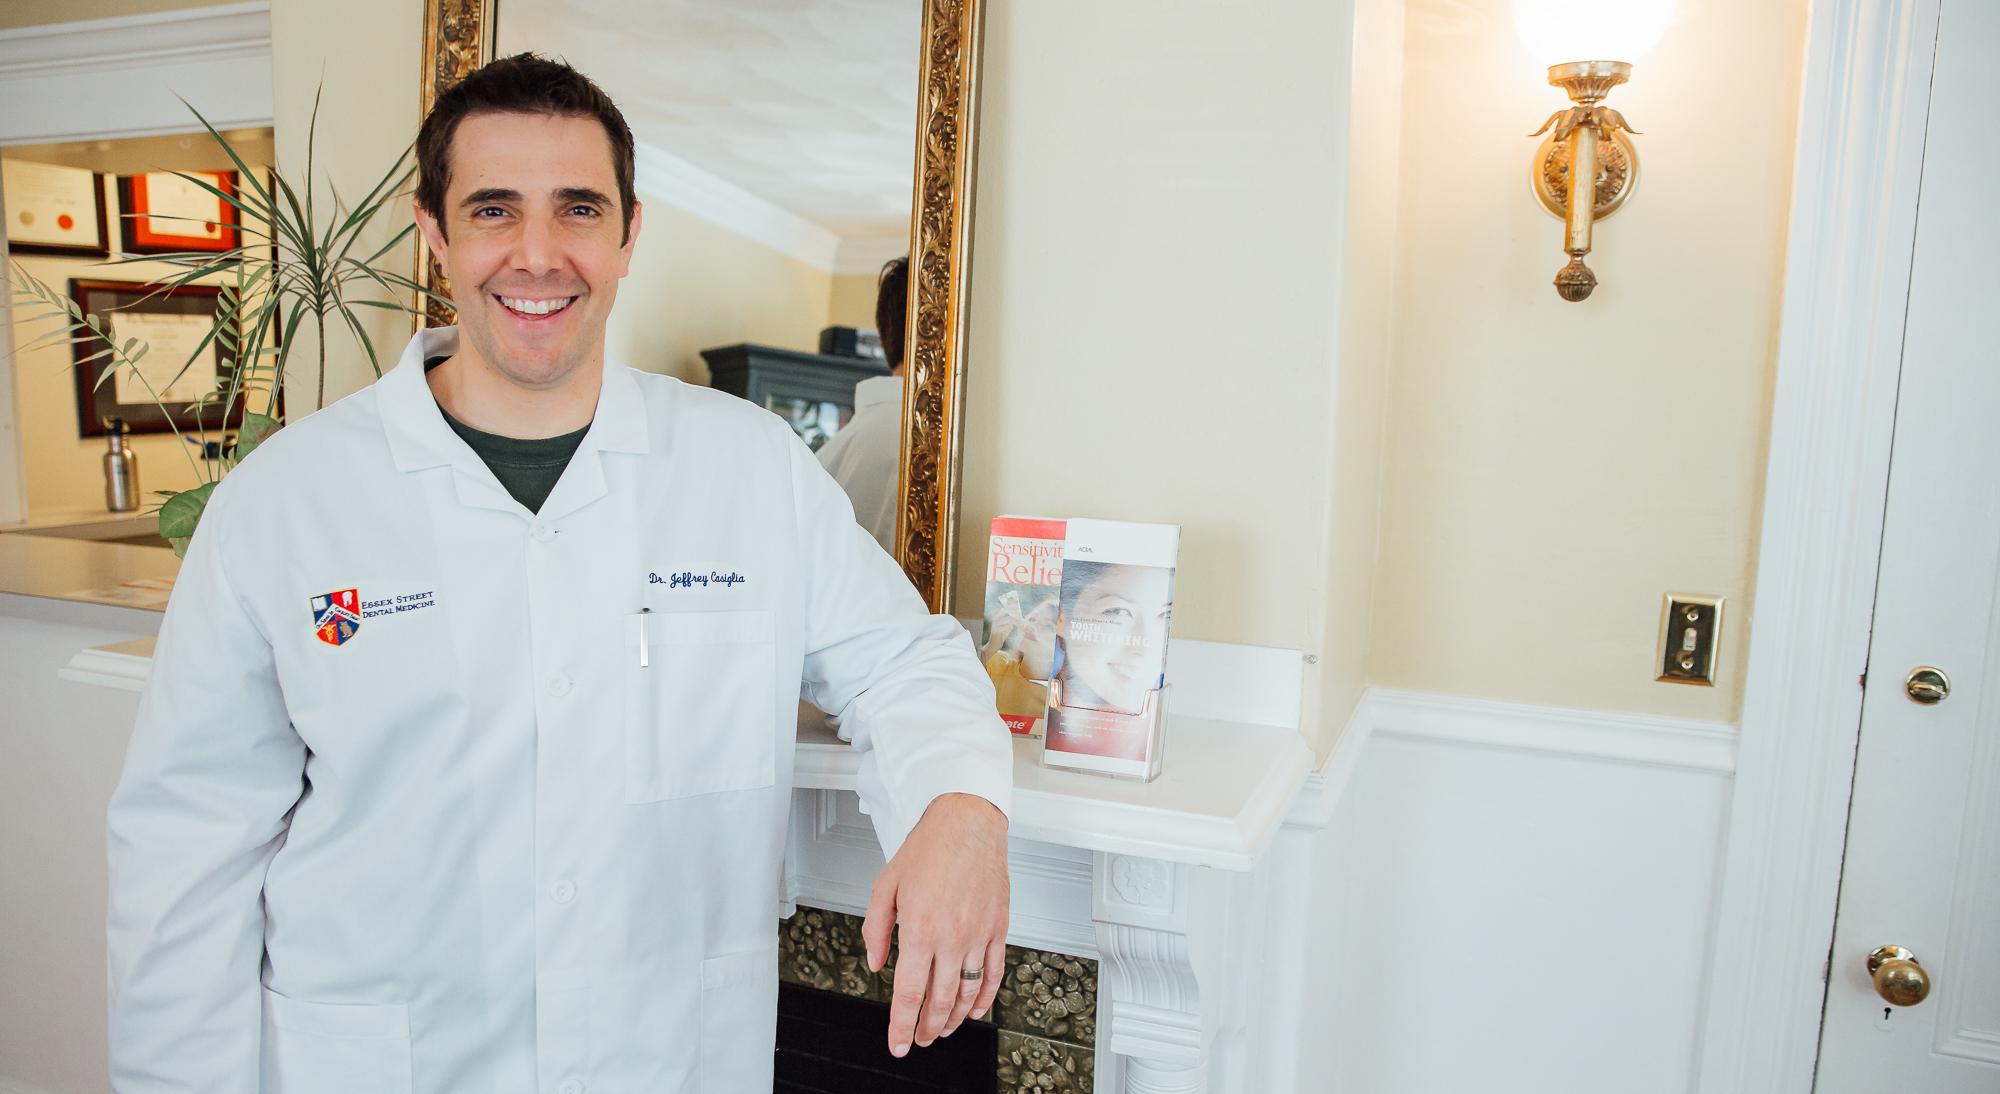 Essex Street Dental Medicine